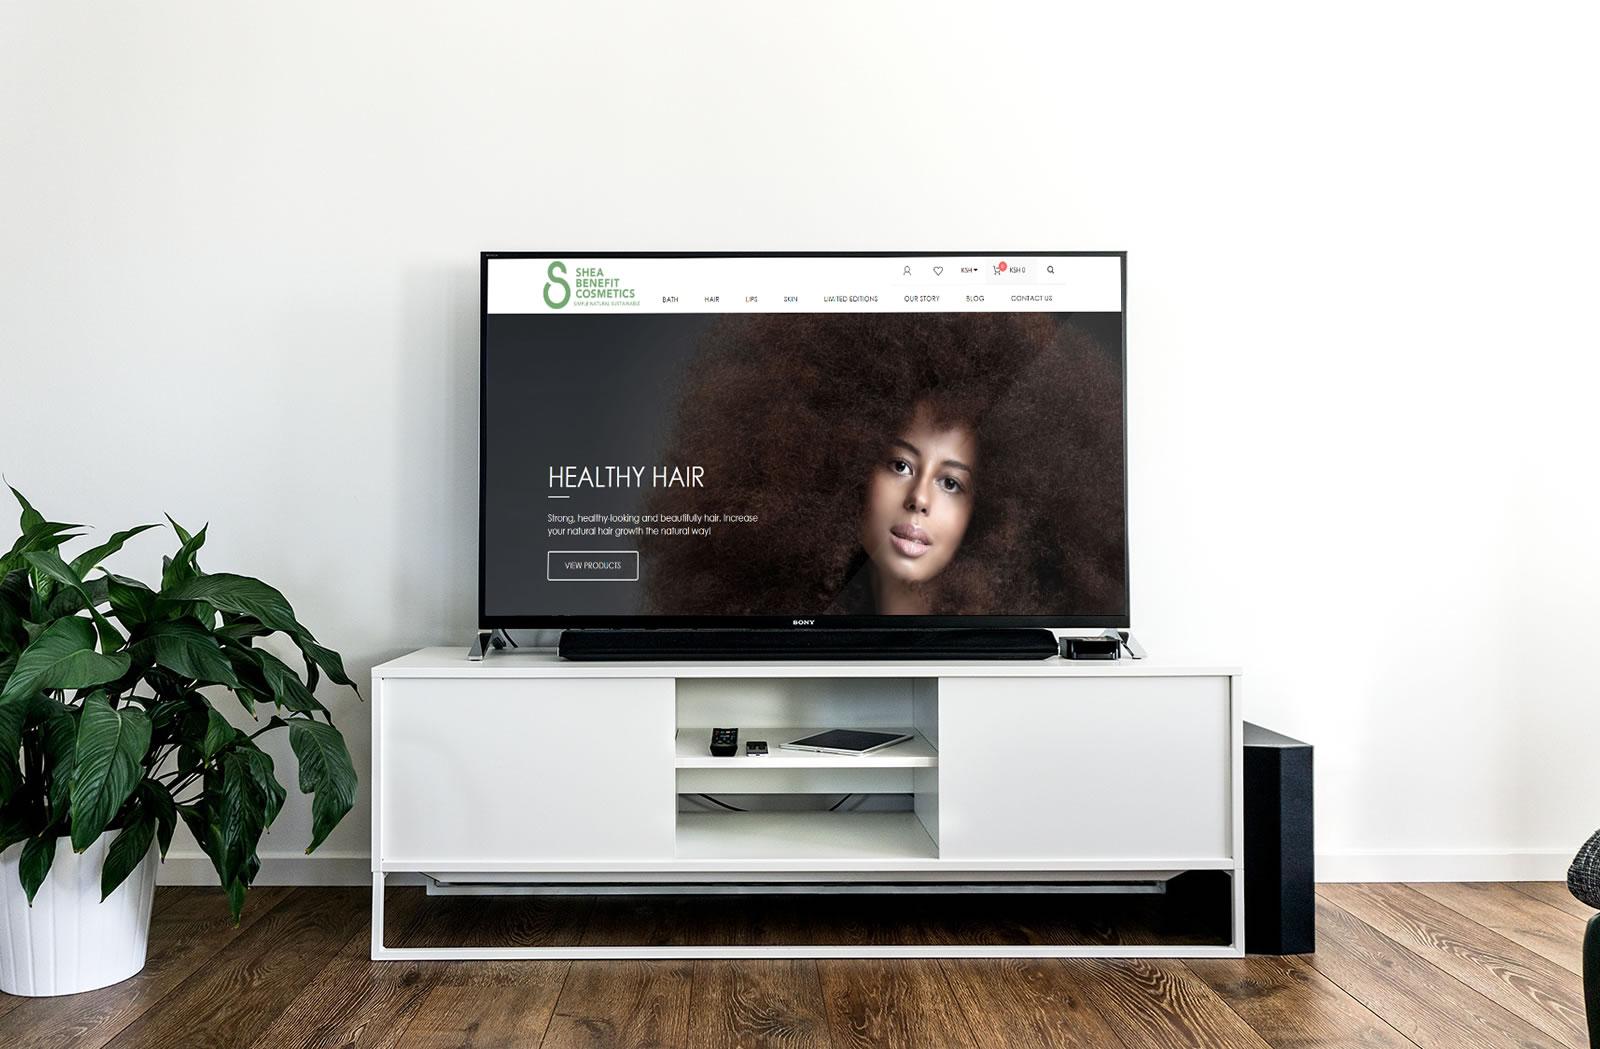 Shea Benefit Cosmetics on TV